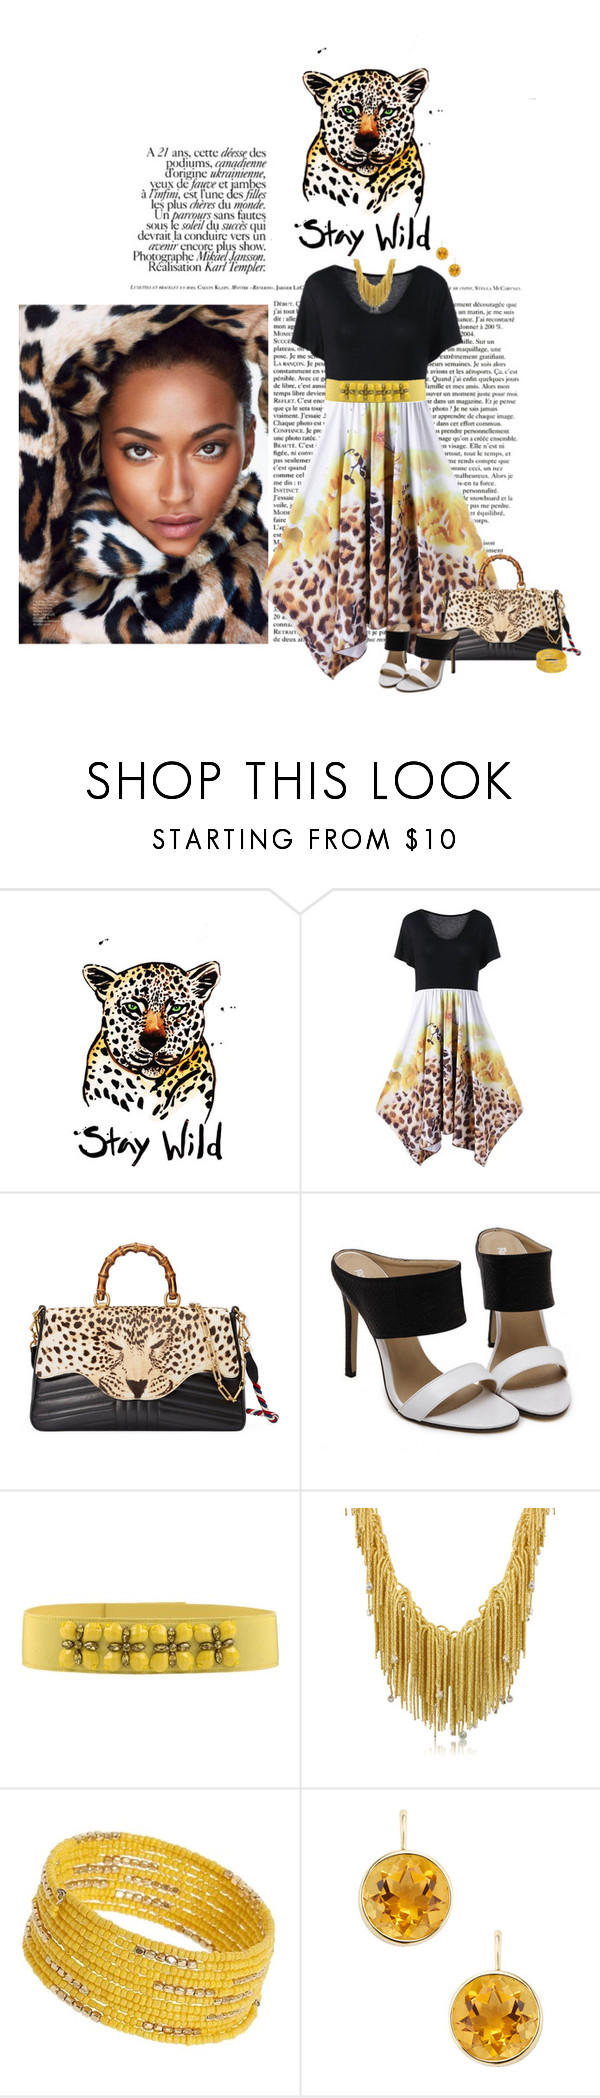 """Stay Wild"" by chileez ❤ liked on Polyvore featuring Gucci, Alberta Ferretti, Orlando Orlandini, Dorothy Perkins and Goshwara"